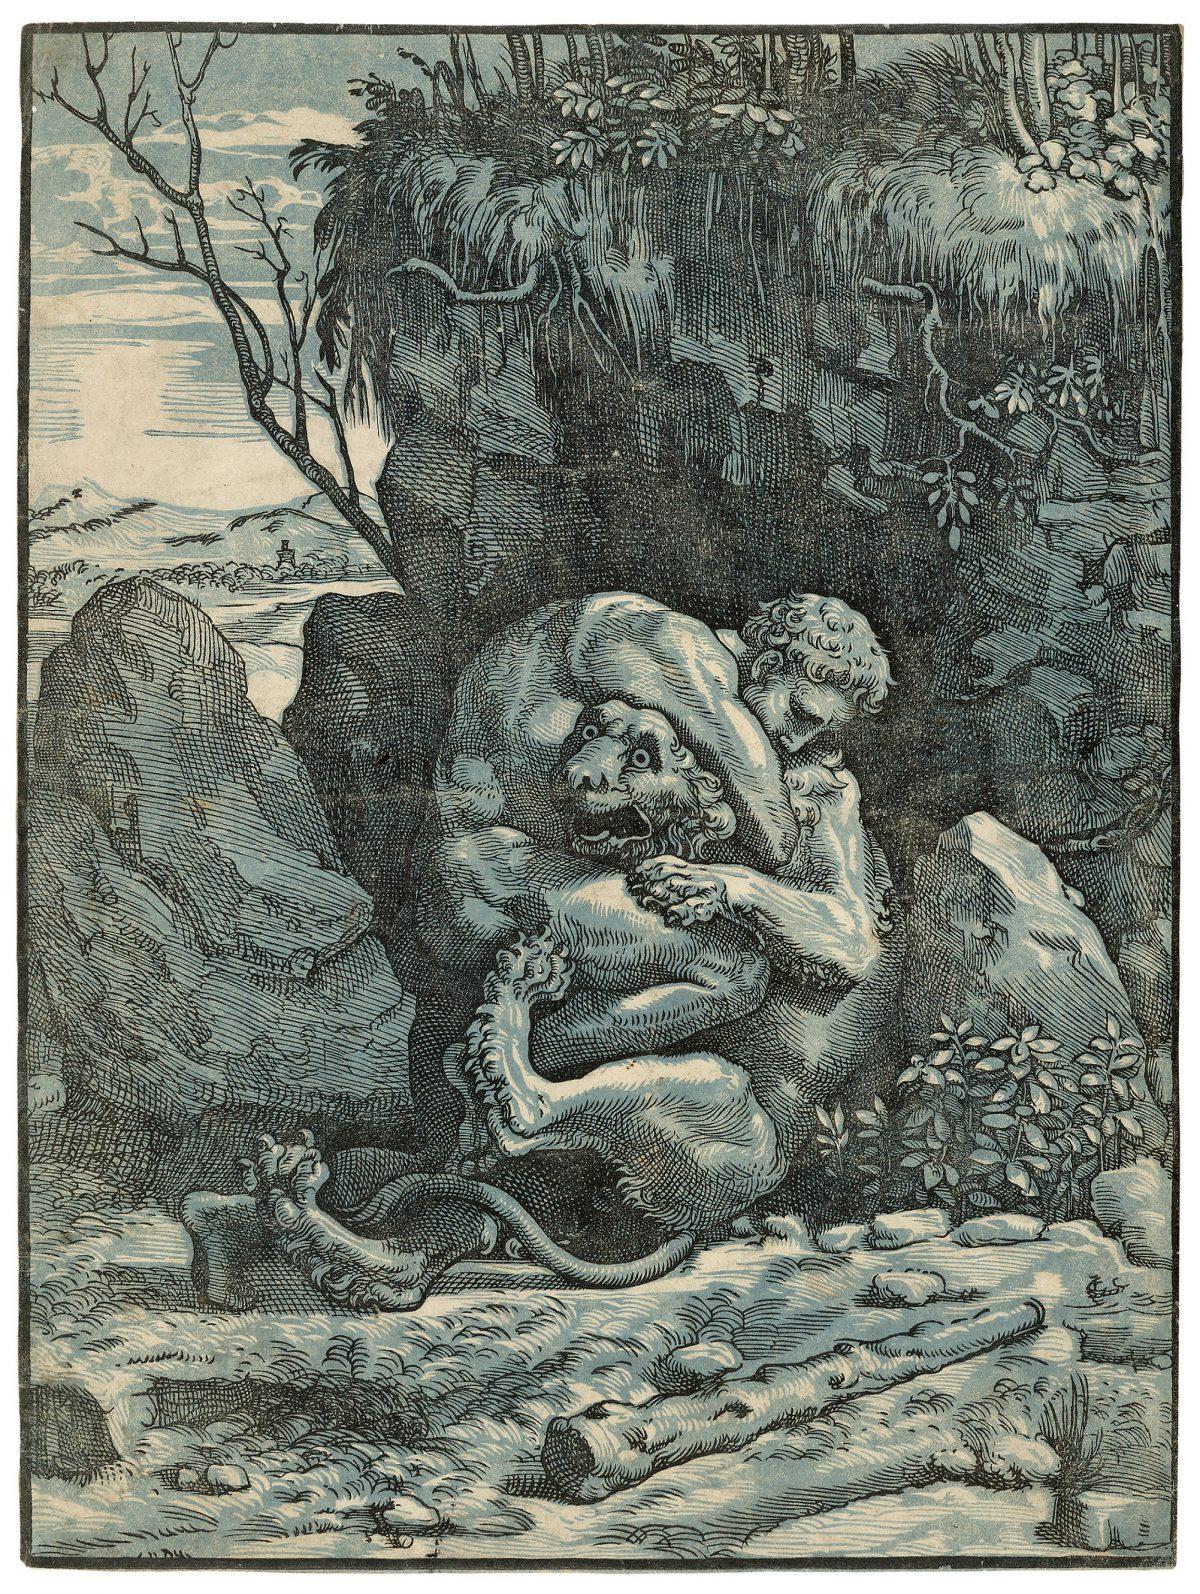 Warrior Hercules wrestles a lion, black and blue chiaroscuro print. Raphael. Ugo da Carpi.